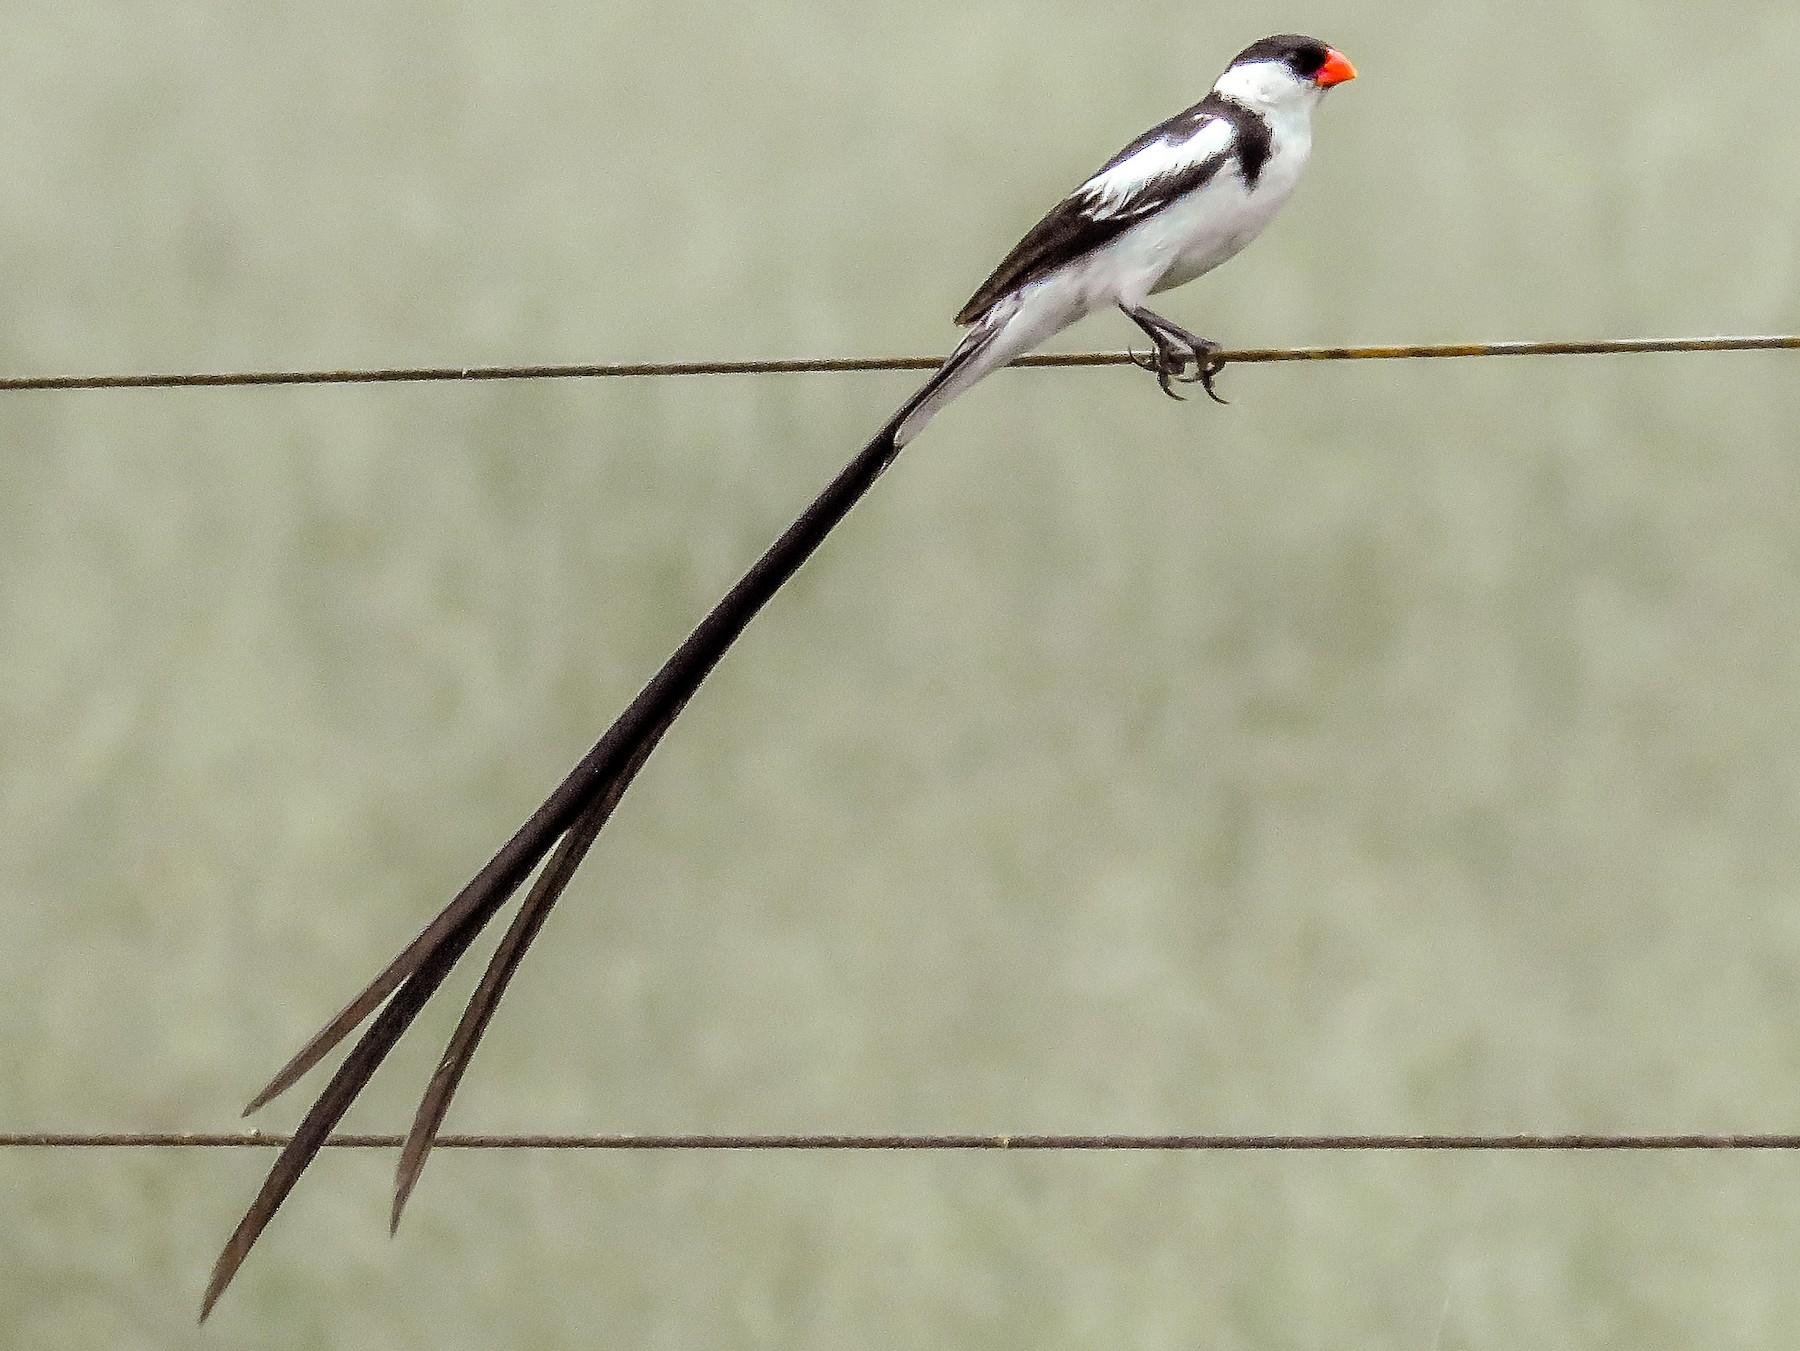 Pin-tailed Whydah - Harvey Fogel